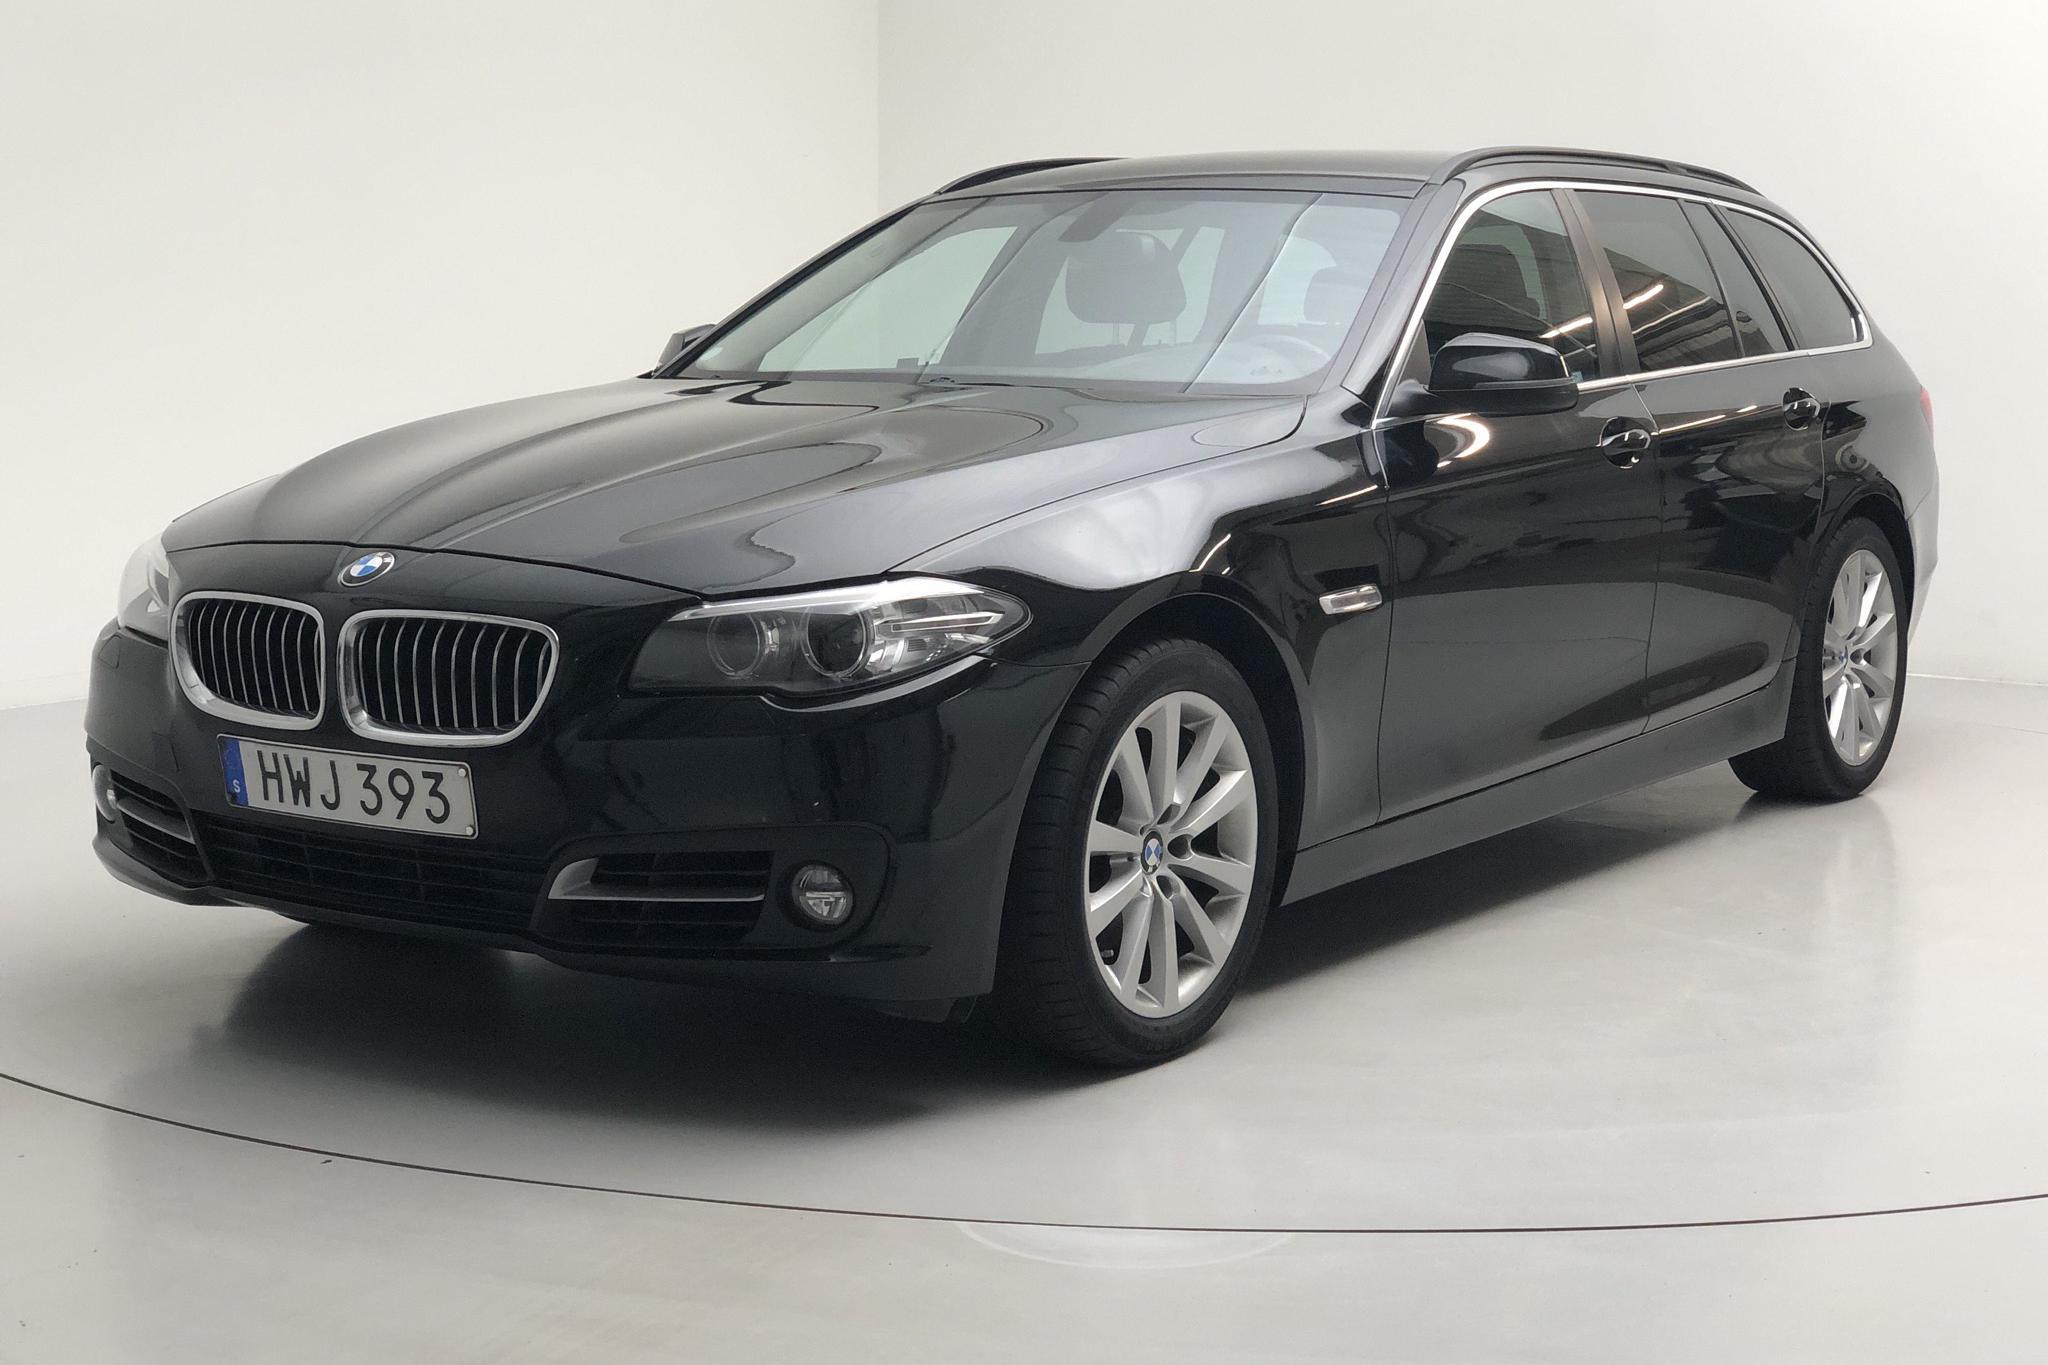 BMW 520d Touring, F11 (190hk) - 55 000 km - Automatic - black - 2016